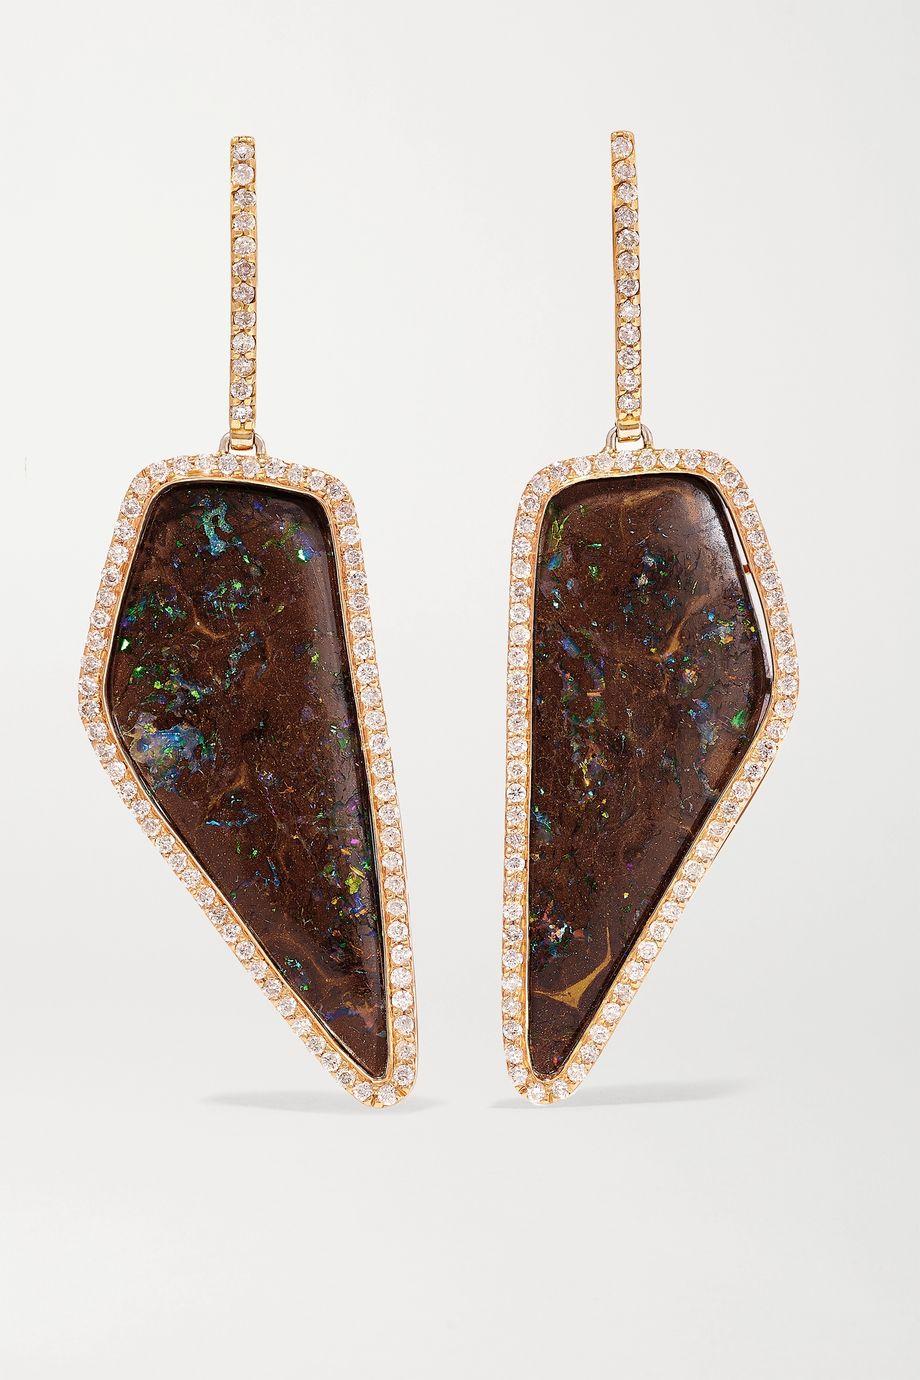 Kimberly McDonald 18-karat rose gold, opal and diamond earrings